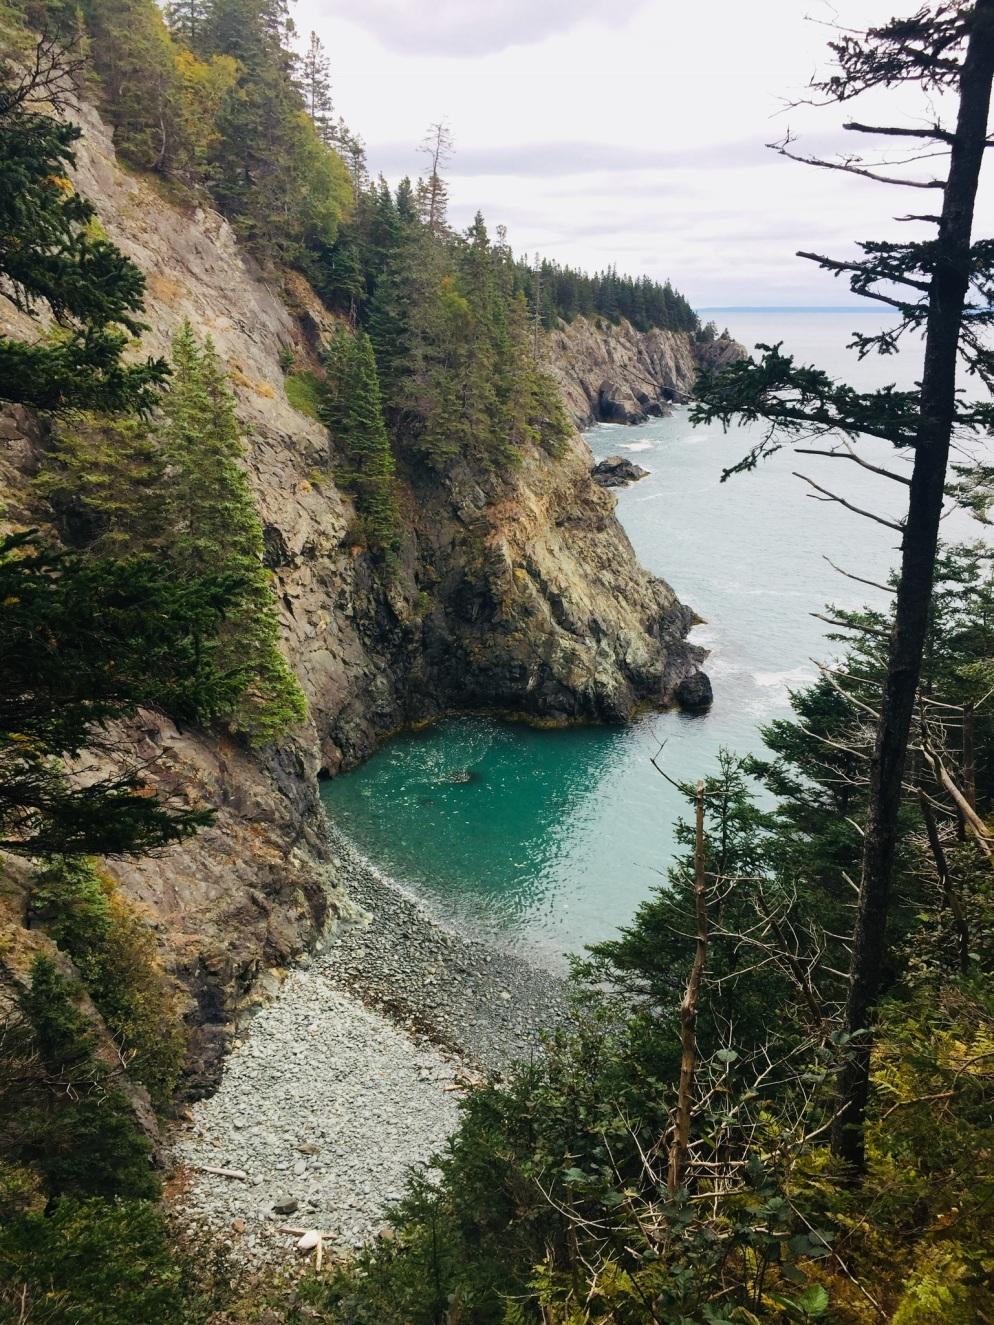 Ocean view from Coastal Trail, Cutler Coast Public Lands